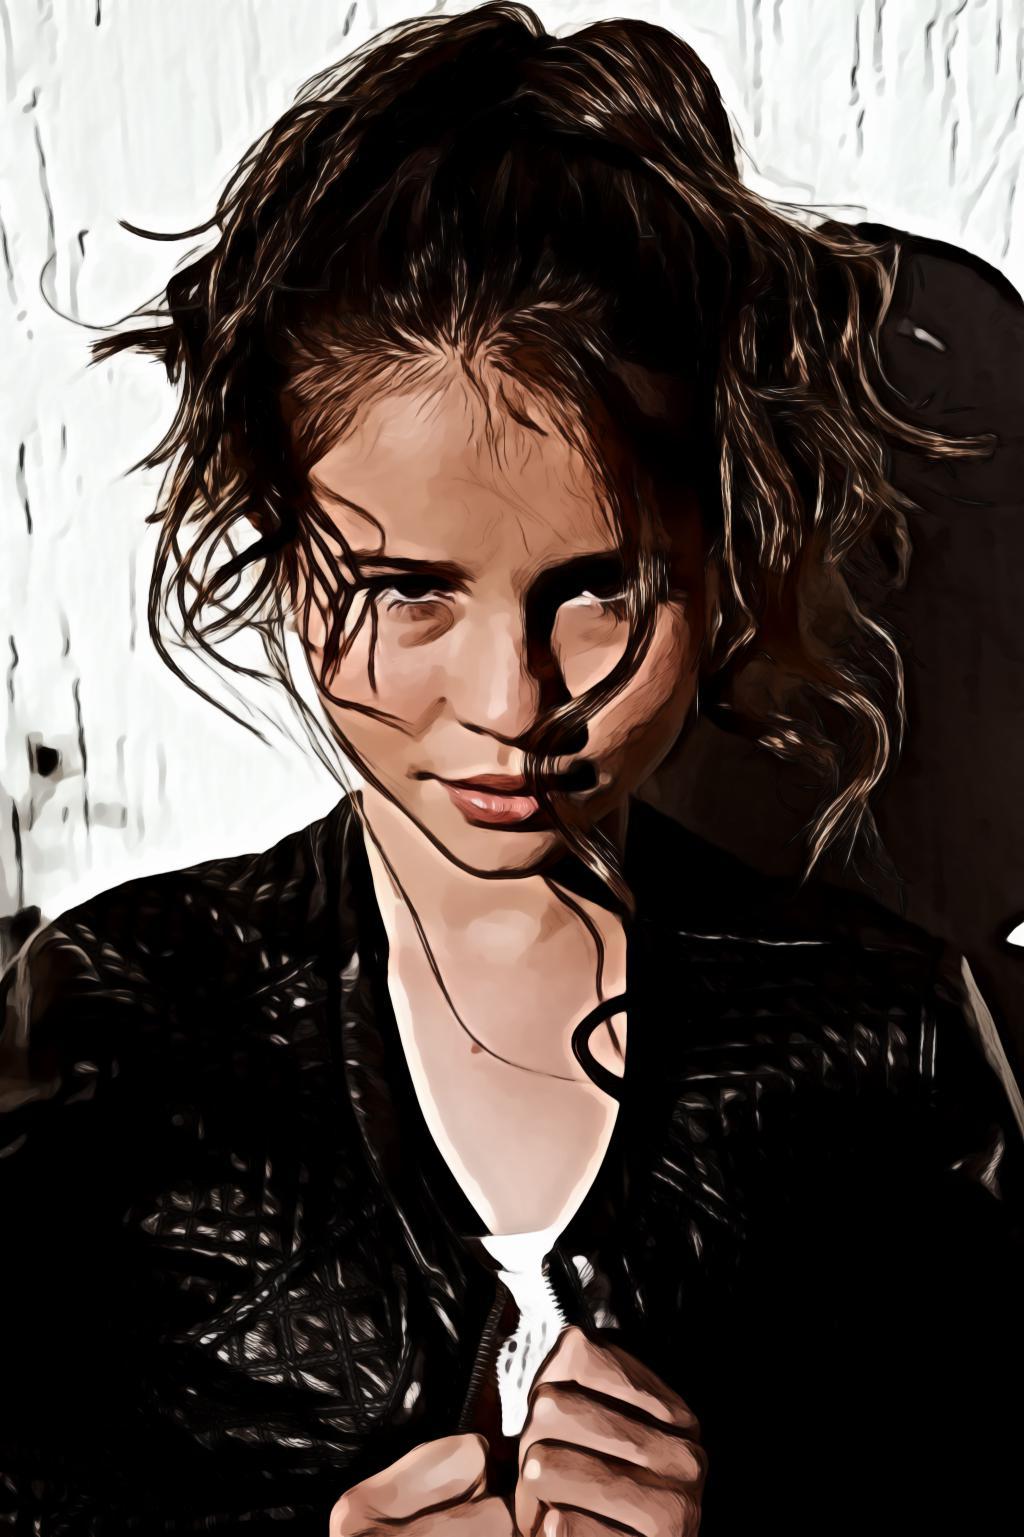 Girl wearing black leather zip jacket